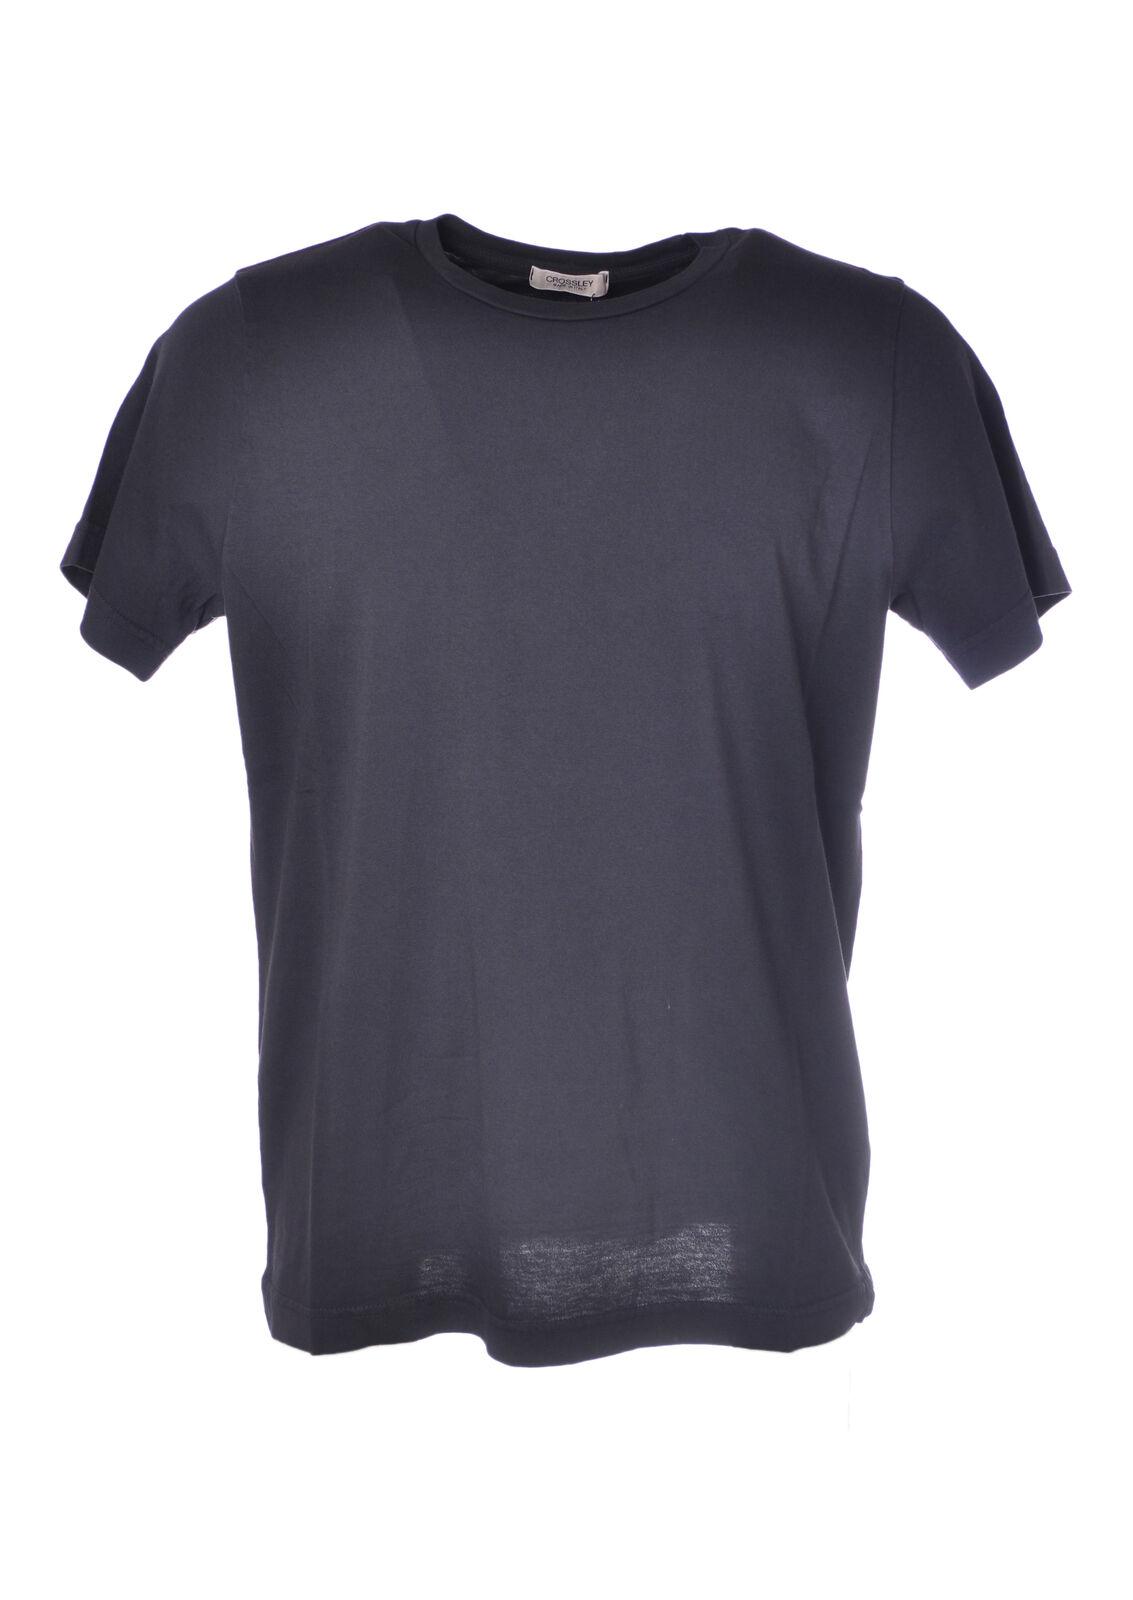 CROSSLEY - Topwear-T-shirts - Man - bluee - 5057005G184330